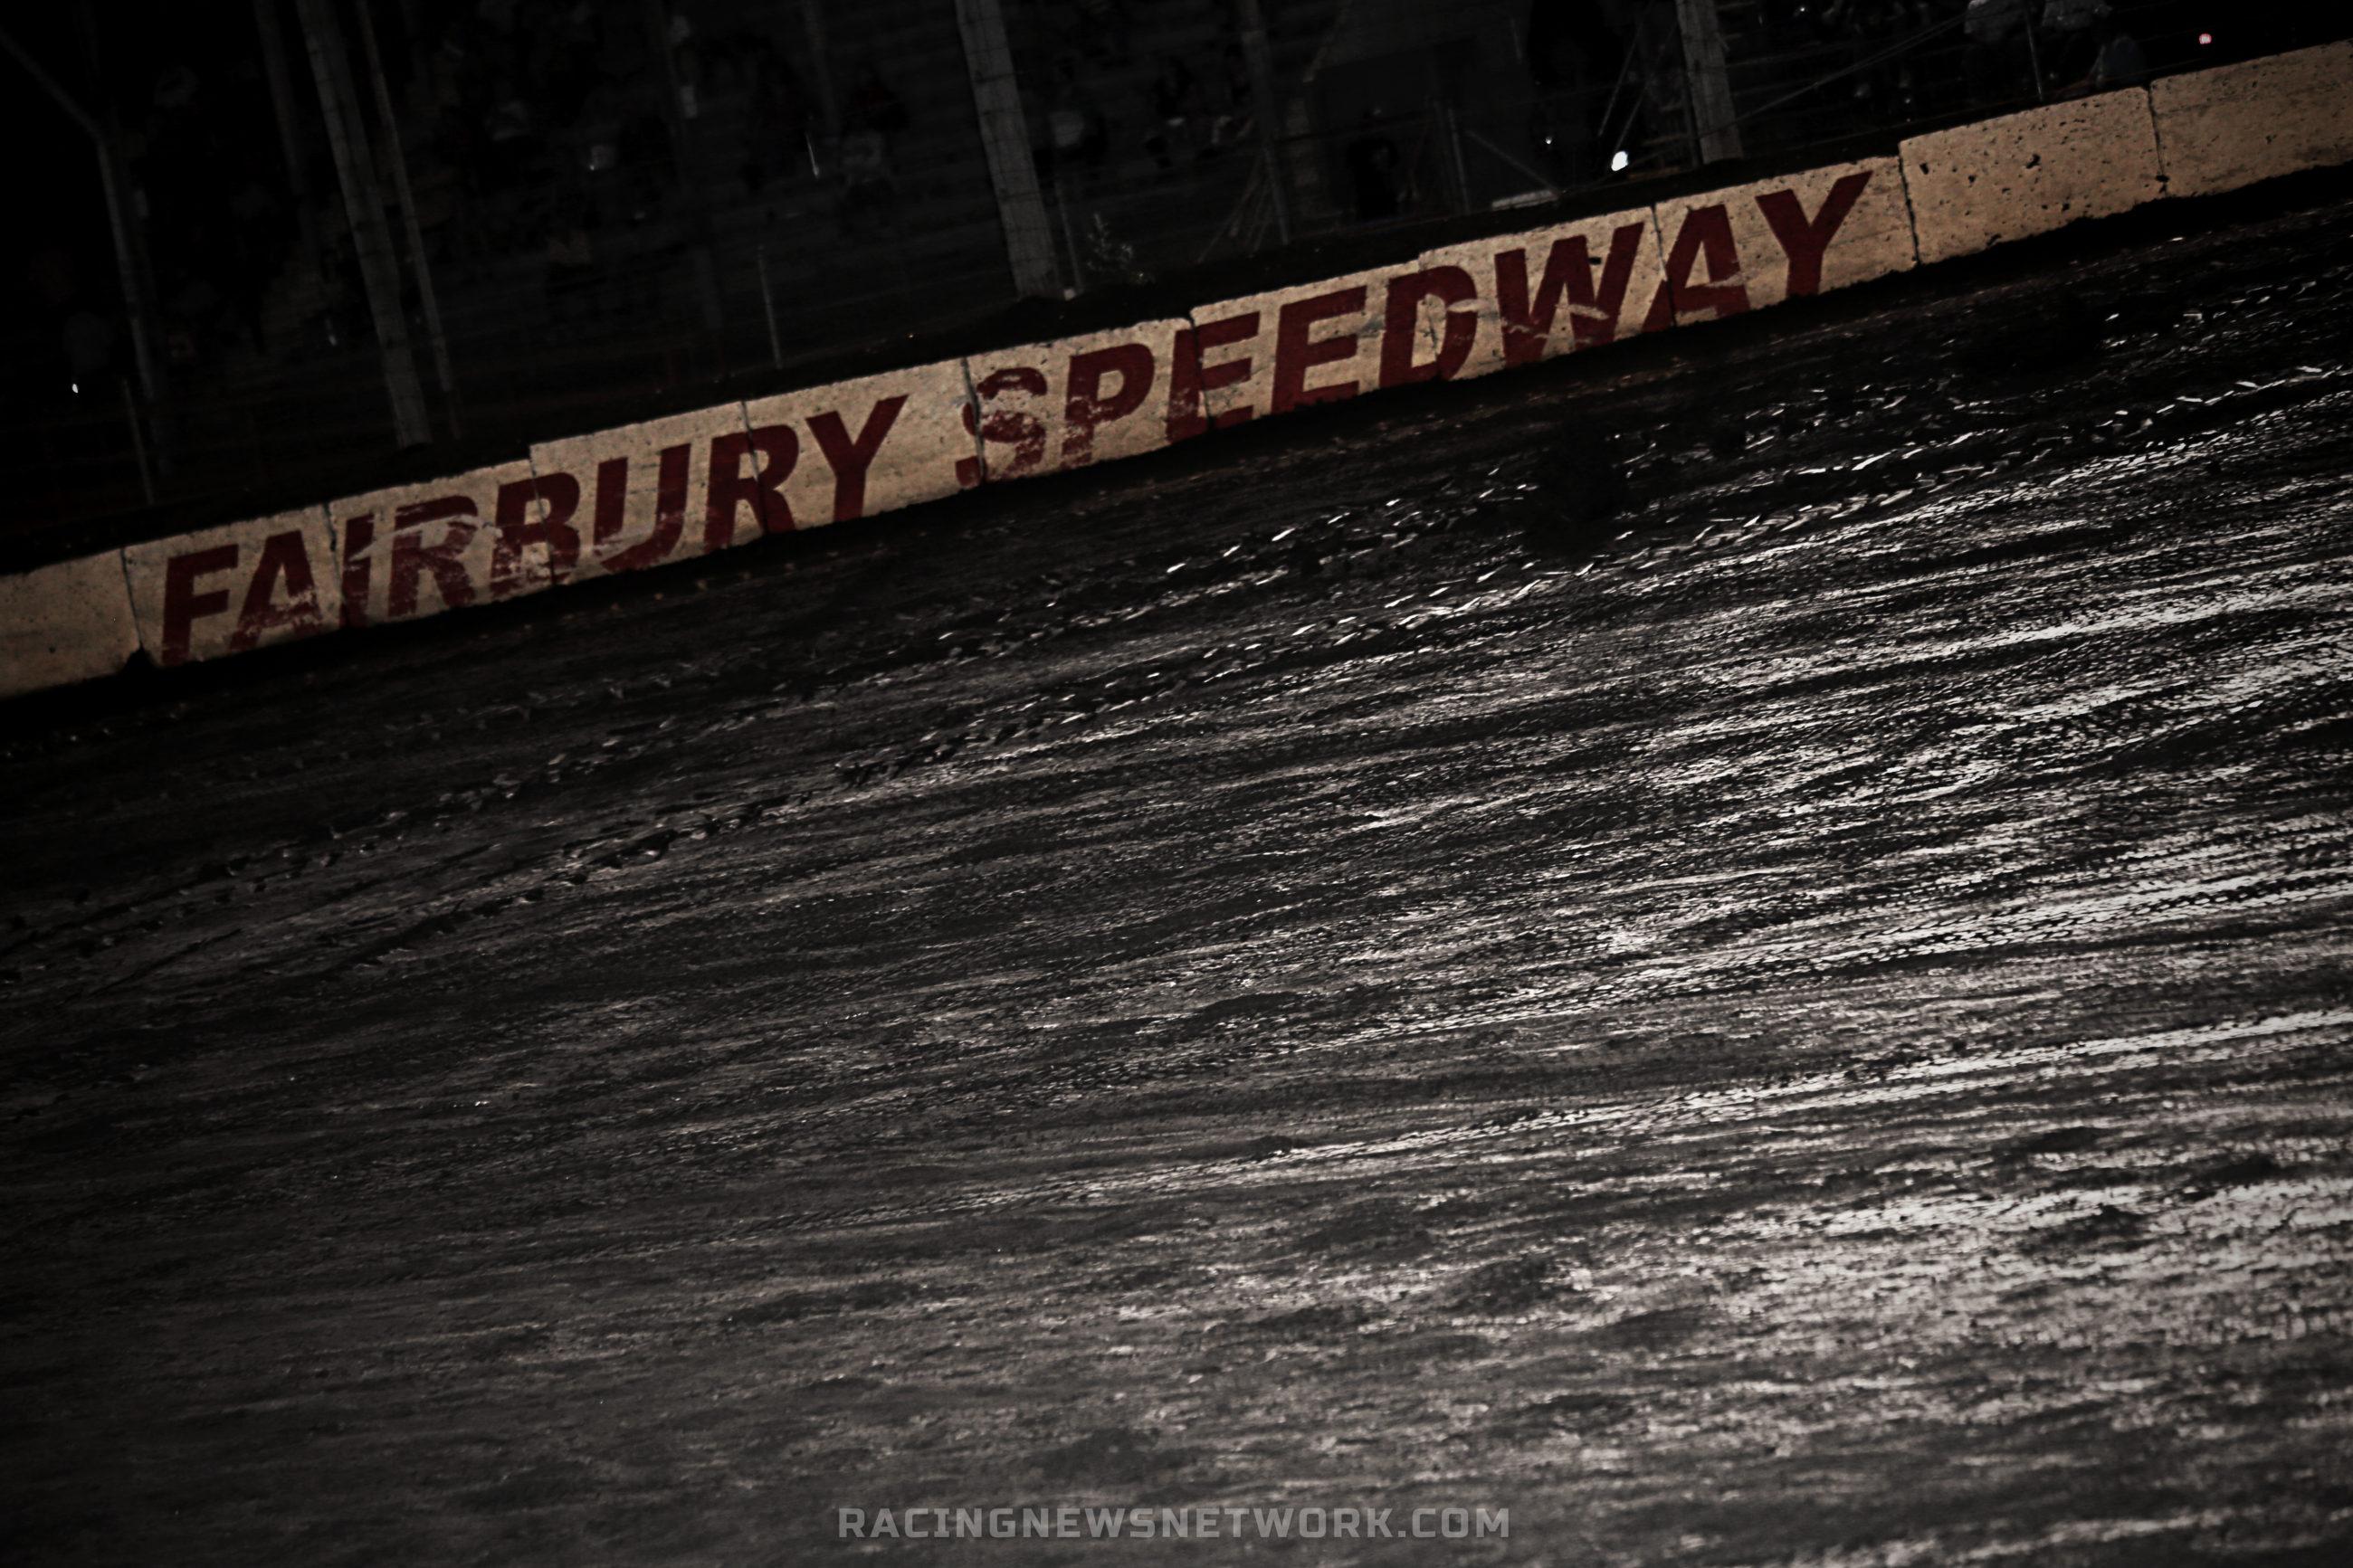 American Modified Series 2017 Schedule - Fairbury Speedway